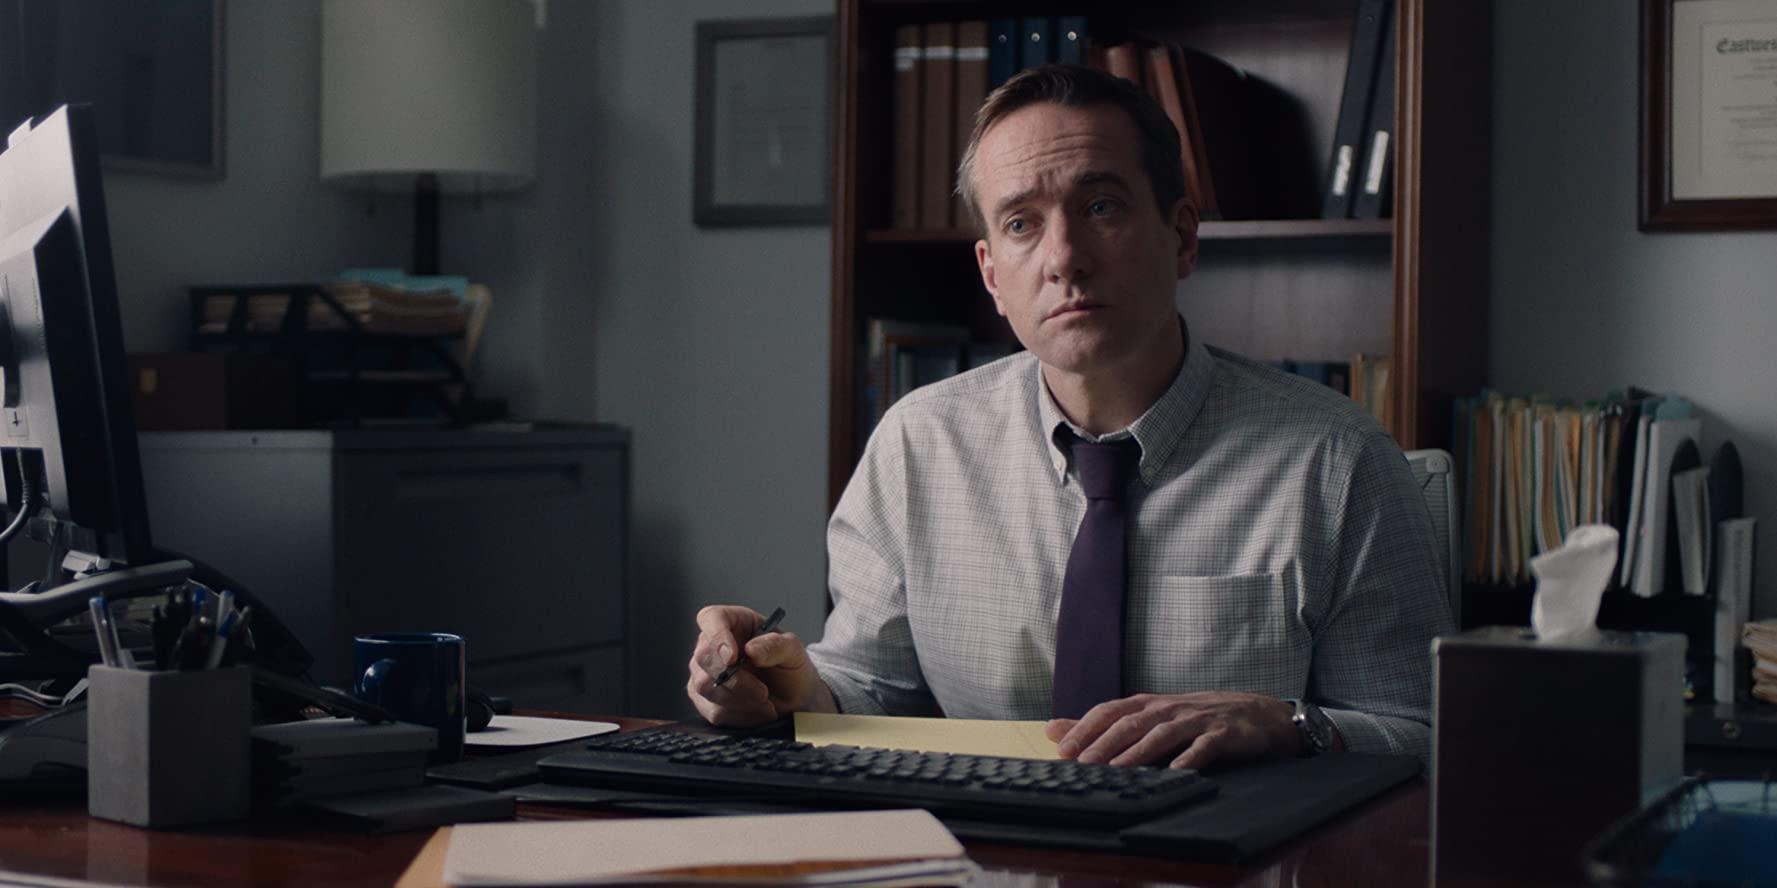 مشاهدة فيلم The Assistant (2020) مترجم HD اون لاين